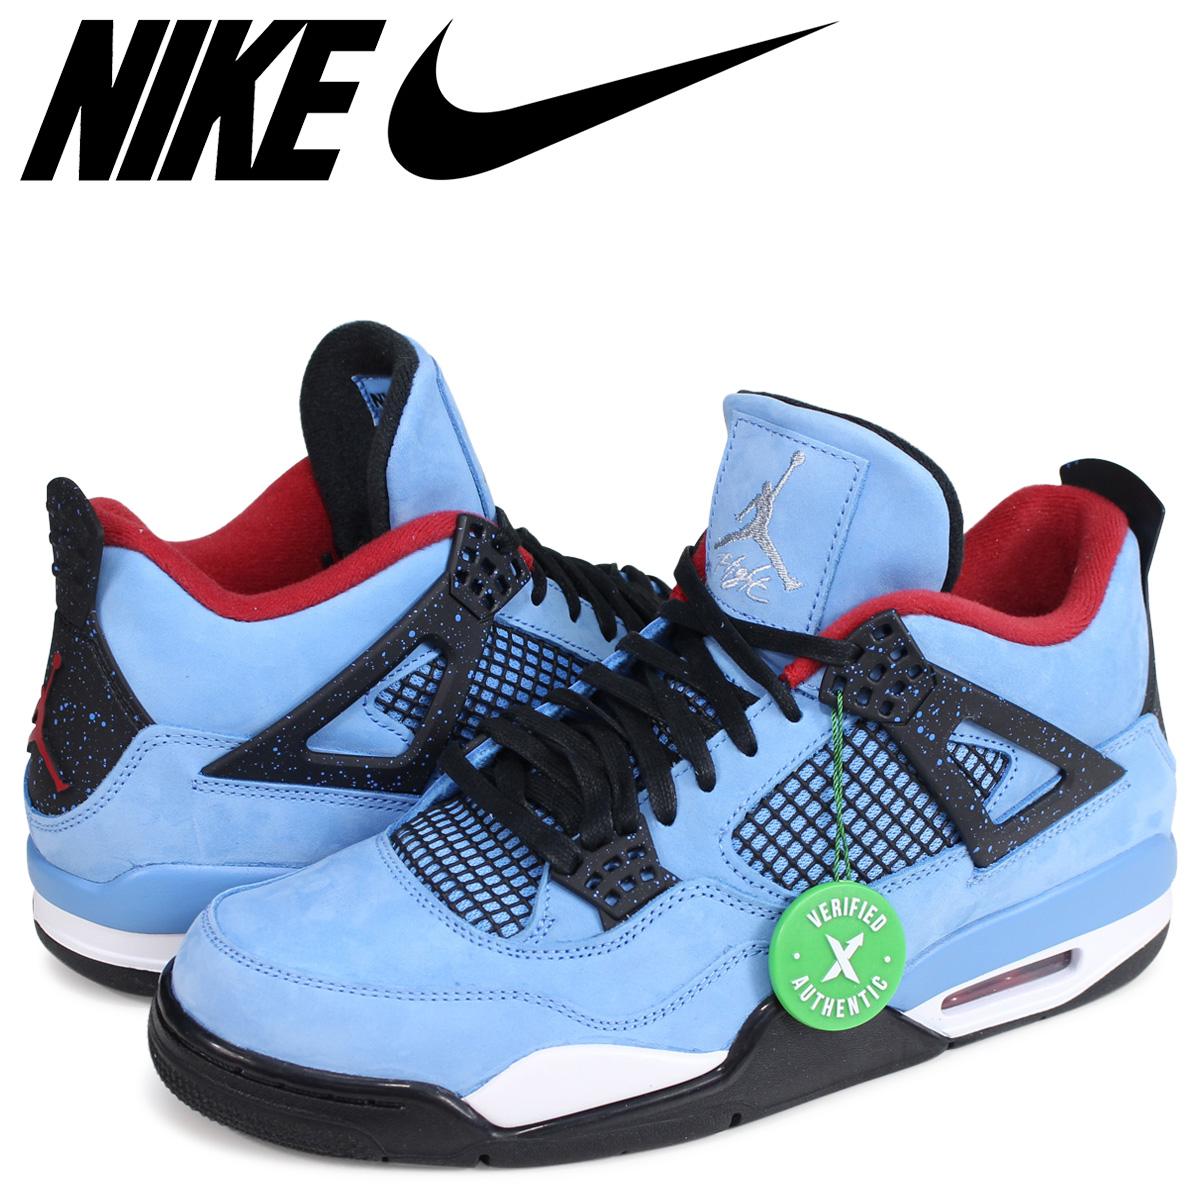 outlet store a5ea5 8539c NIKE AIR JORDAN 4 RETRO TRAVIS SCOTT Nike Air Jordan 4 sneakers 308,497-406  blue